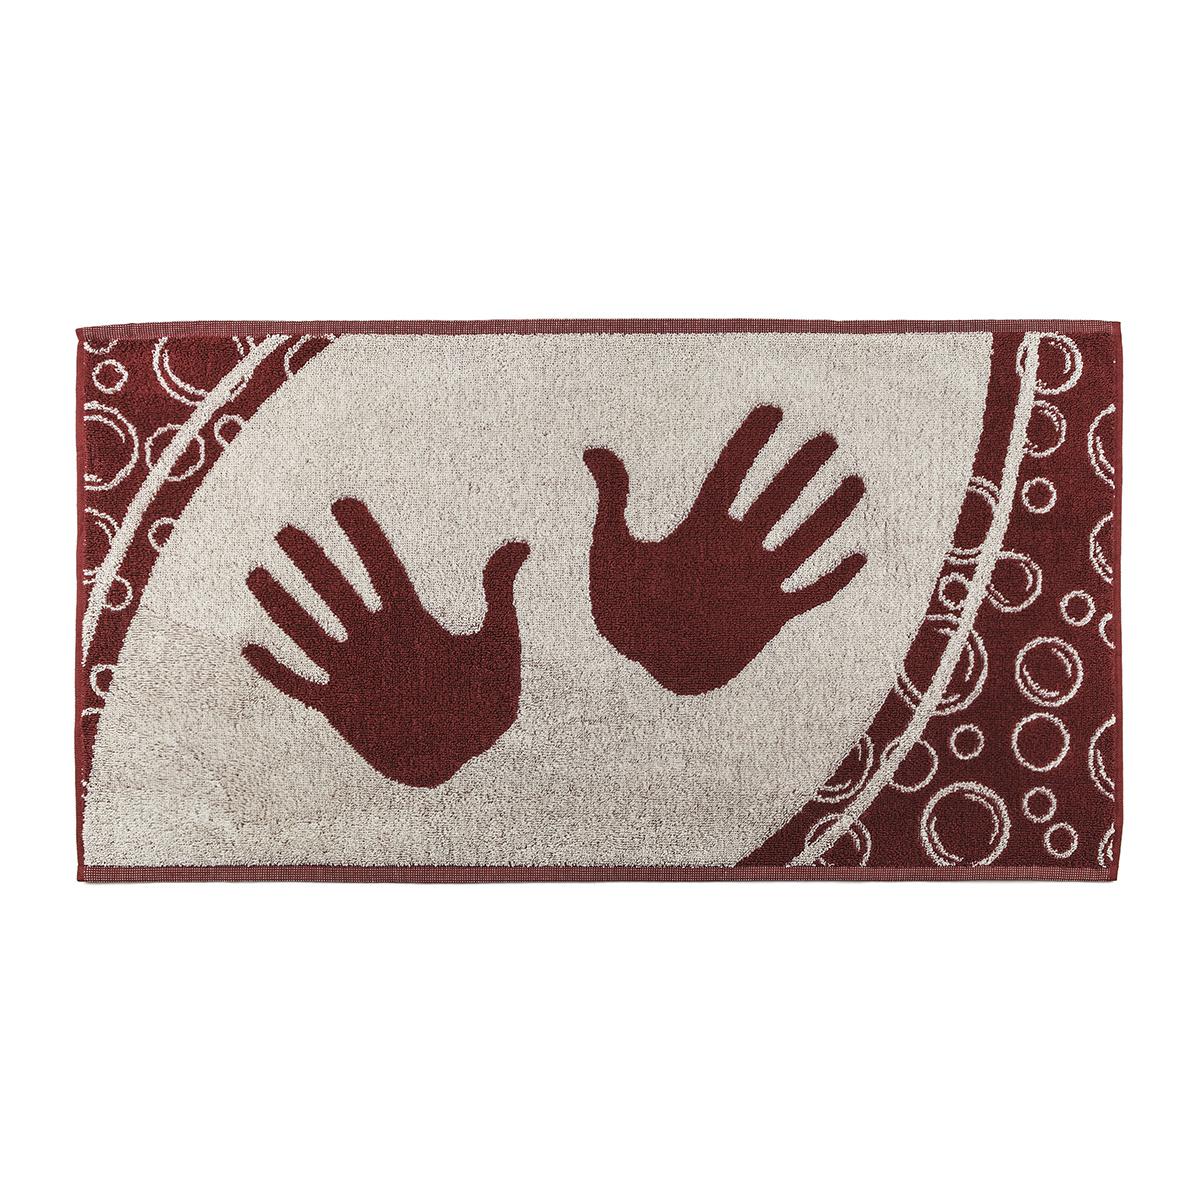 Полотенце Для рук арт. 0521, размер 40х70 см.Махровые полотенца<br>Плотность ткани:420 г/кв. м<br><br>Тип: Полотенце<br>Размер: 40х70<br>Материал: Махра